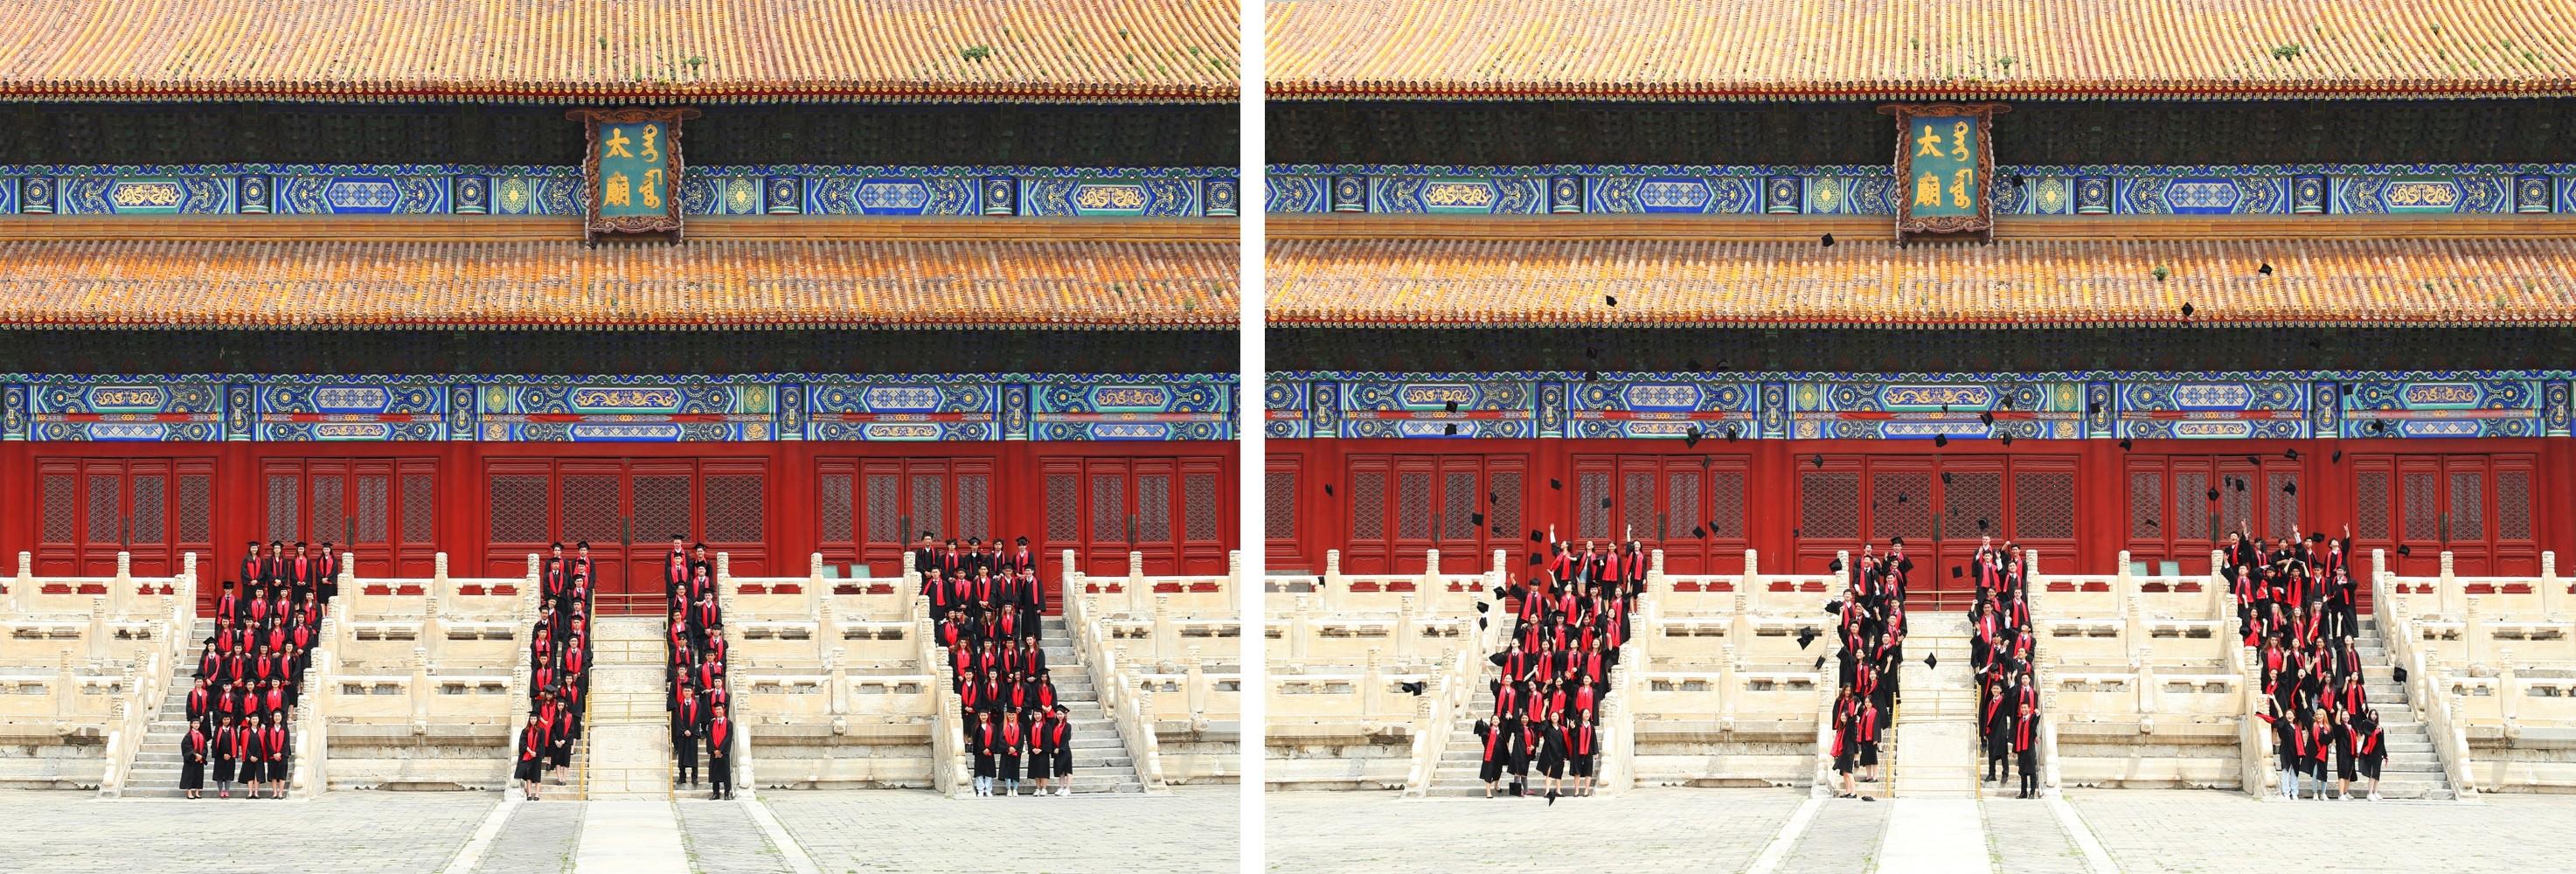 graduation-dulwich-college-beijing-20200630-152058-1-Dulwich_College_Beijing-20200731-171150-190